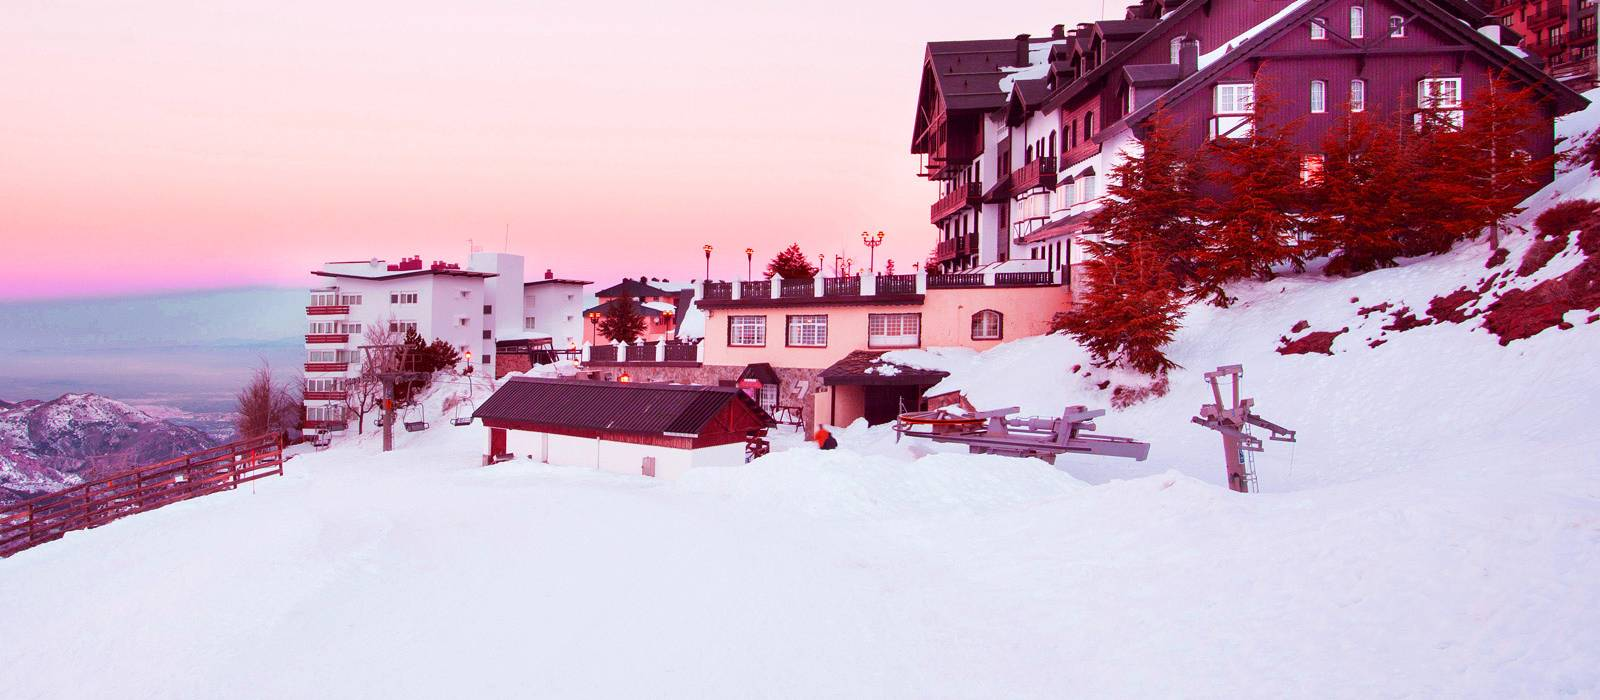 Energetic - Vincci Hoteles